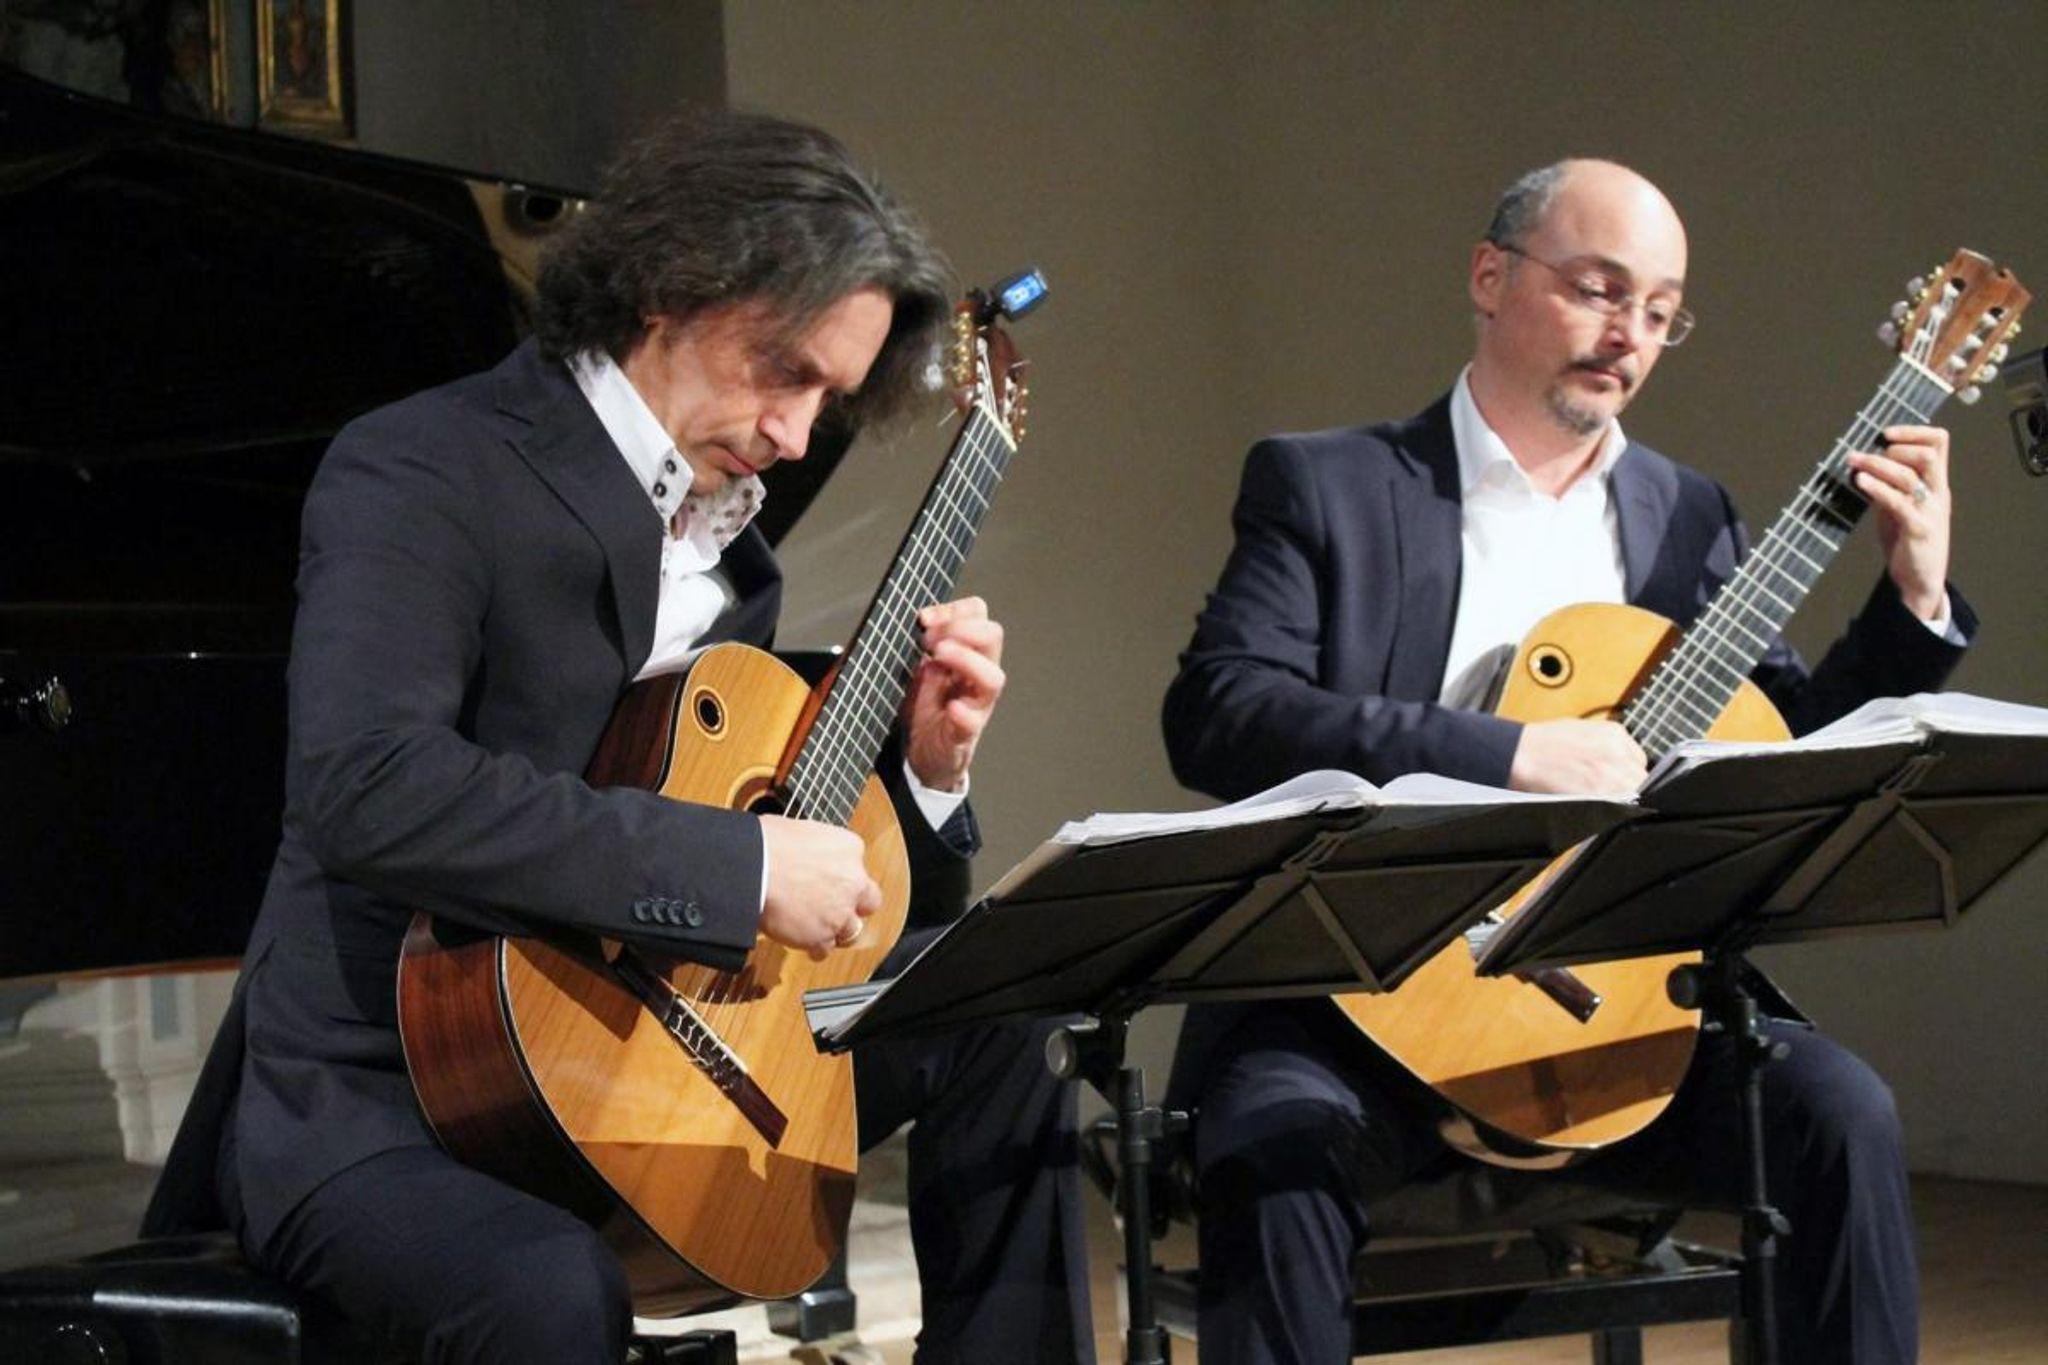 The Masters of the Neapolitan School